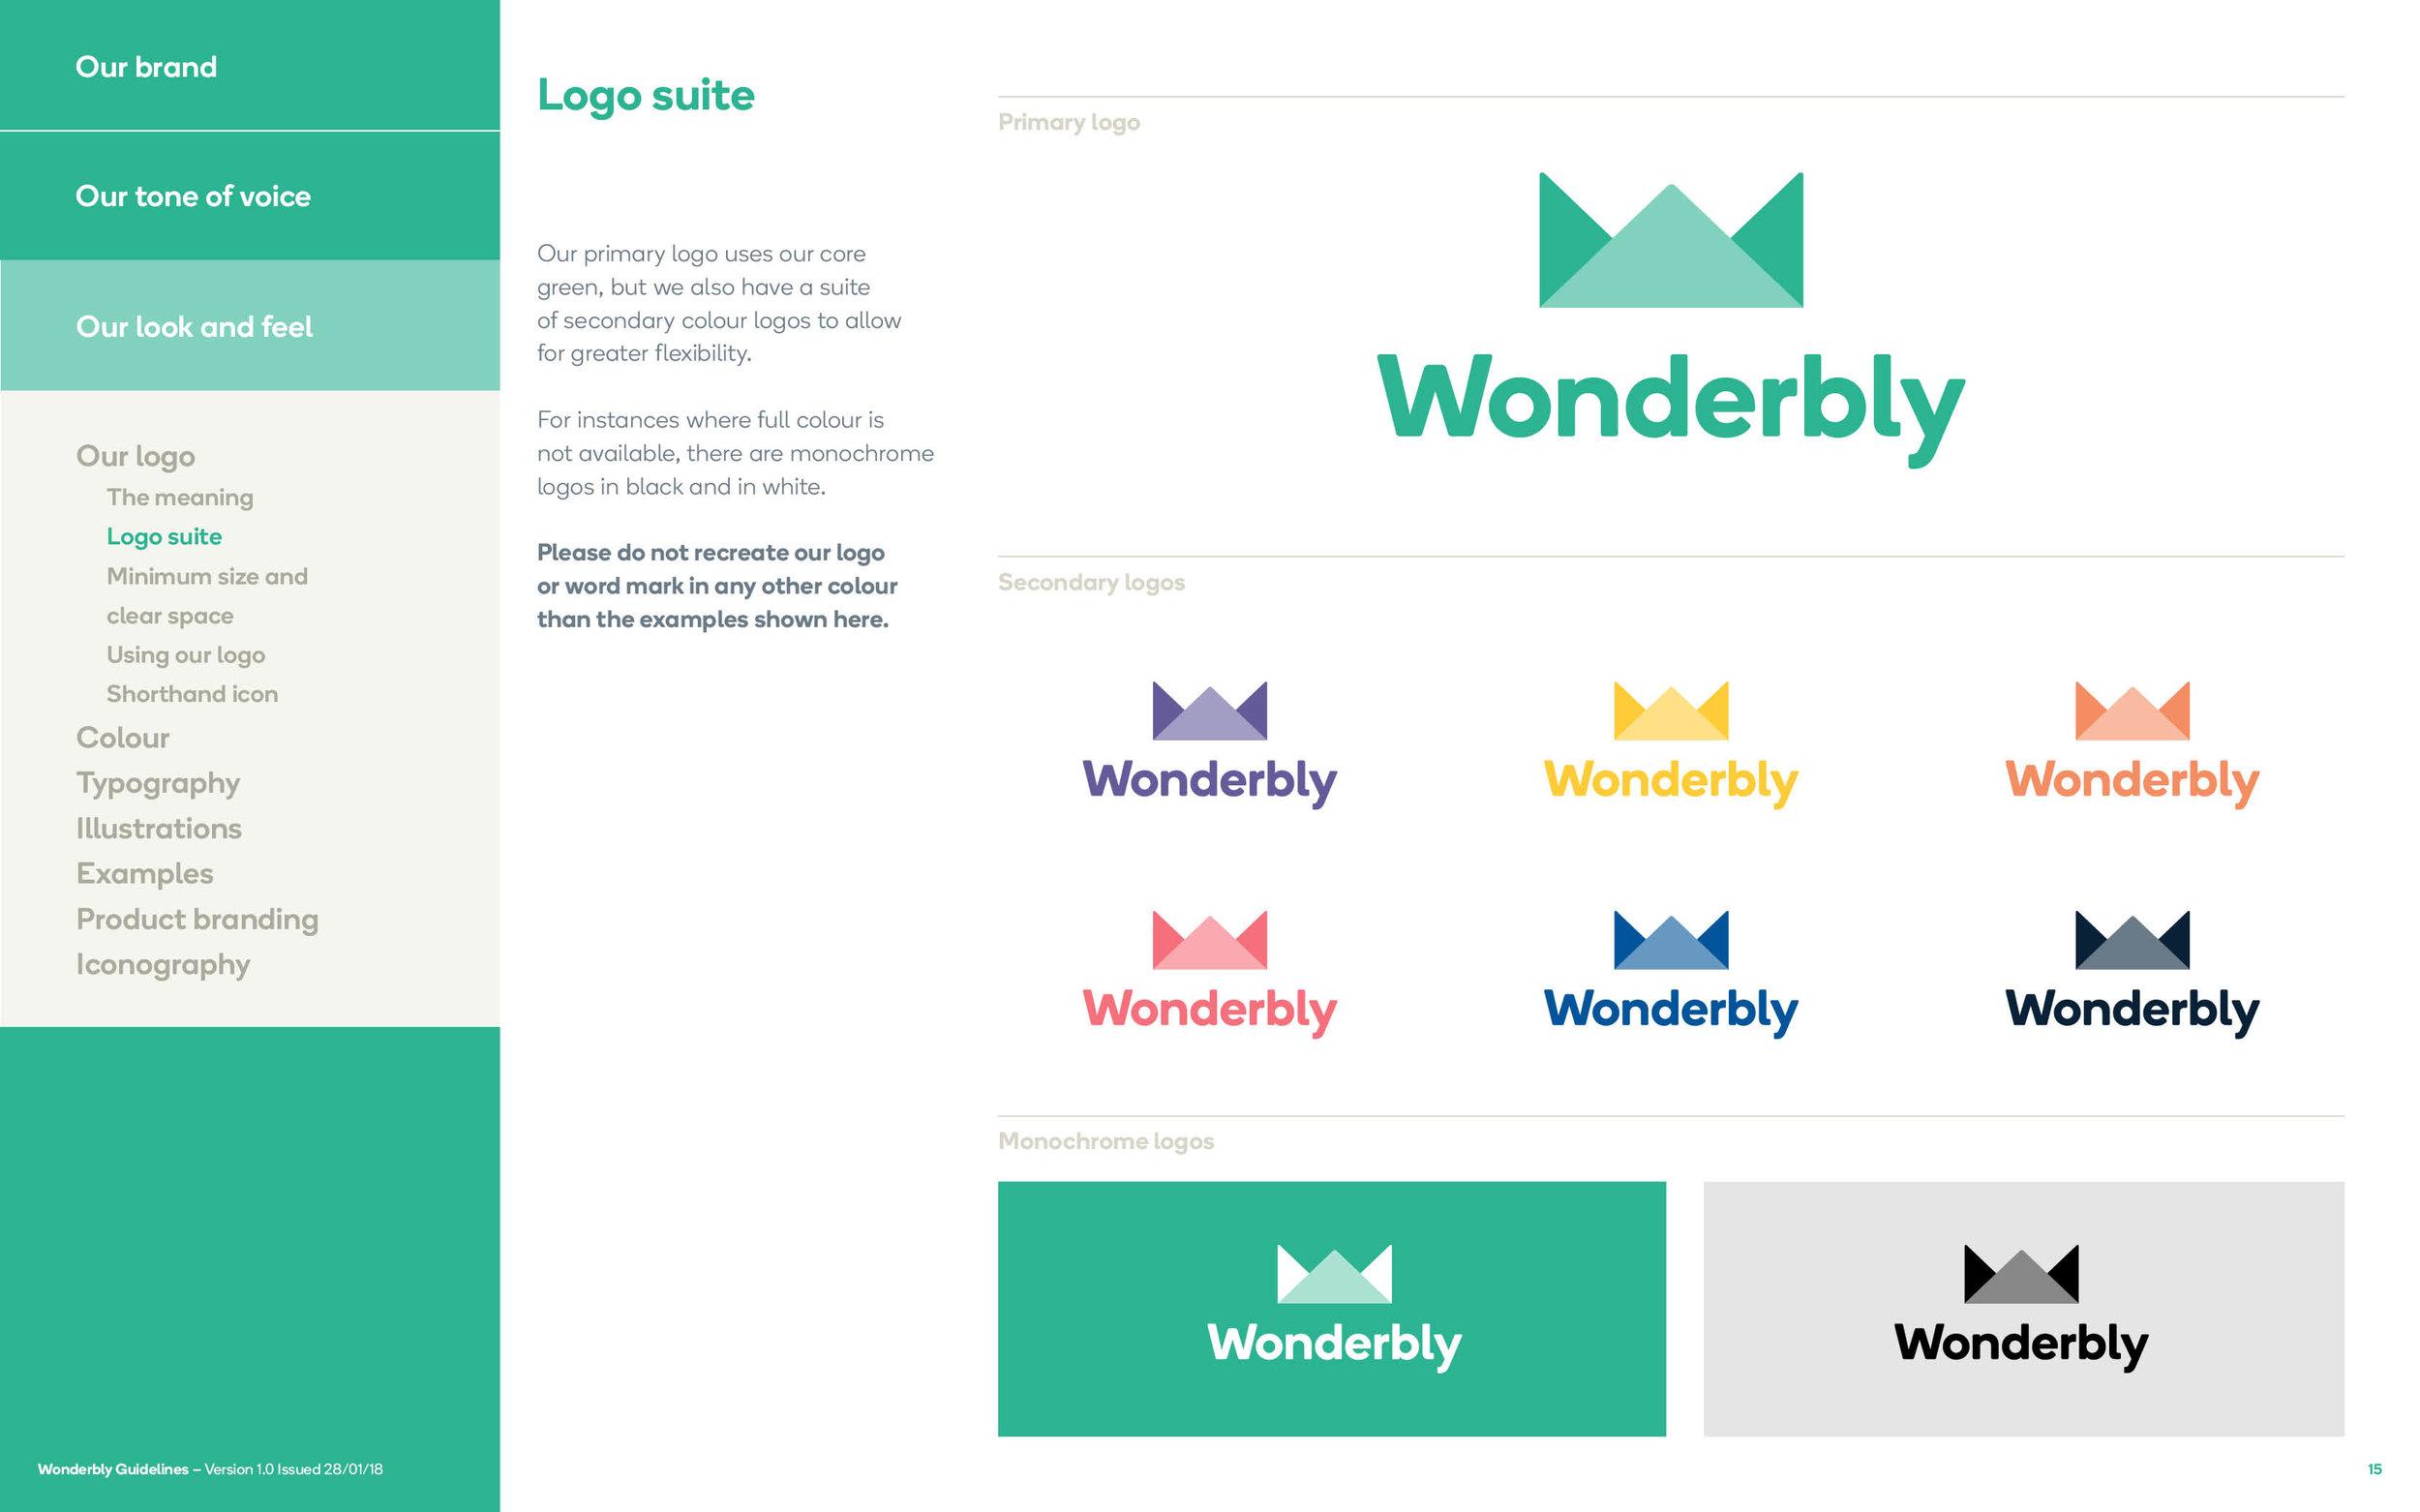 Wonderbly_Guidelines_v815.jpg